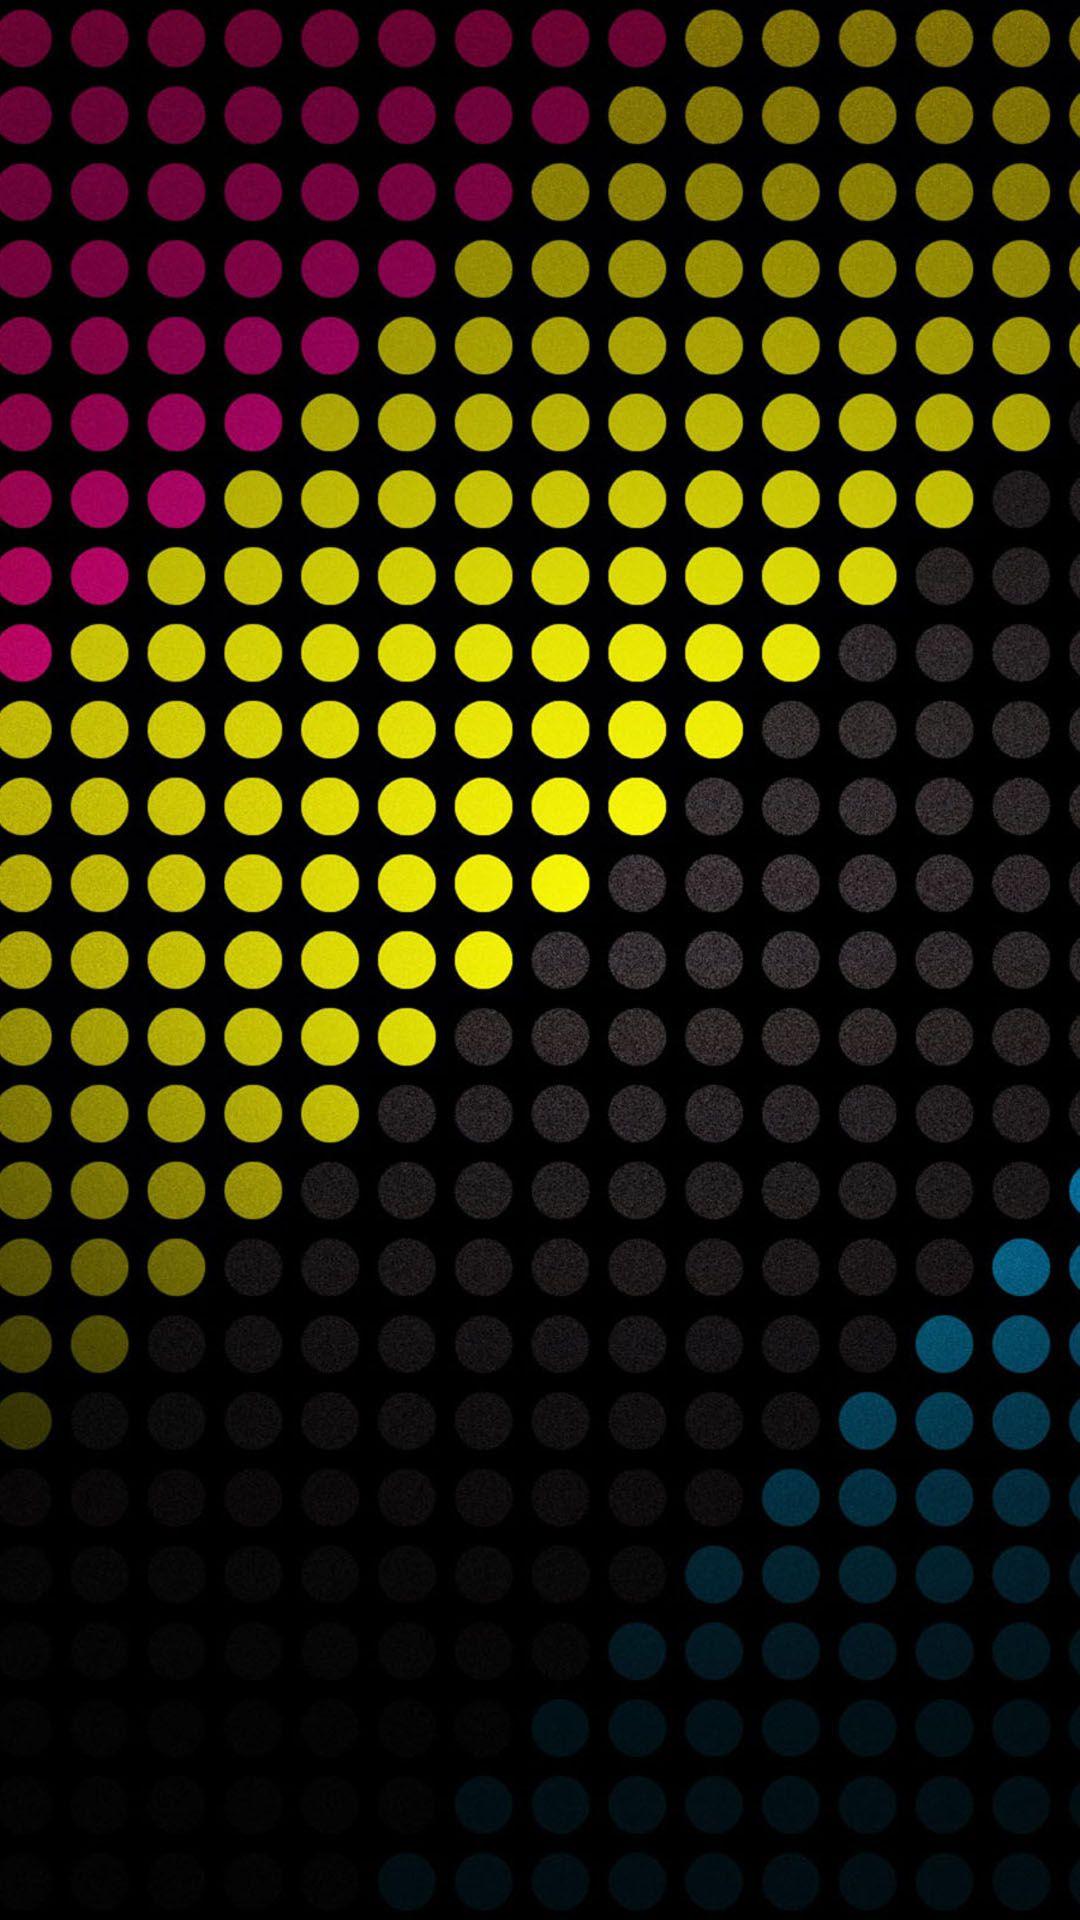 The Best led color Samsung HD wallpaper Samsung HD wallpaper 1080x1920 1080x1920